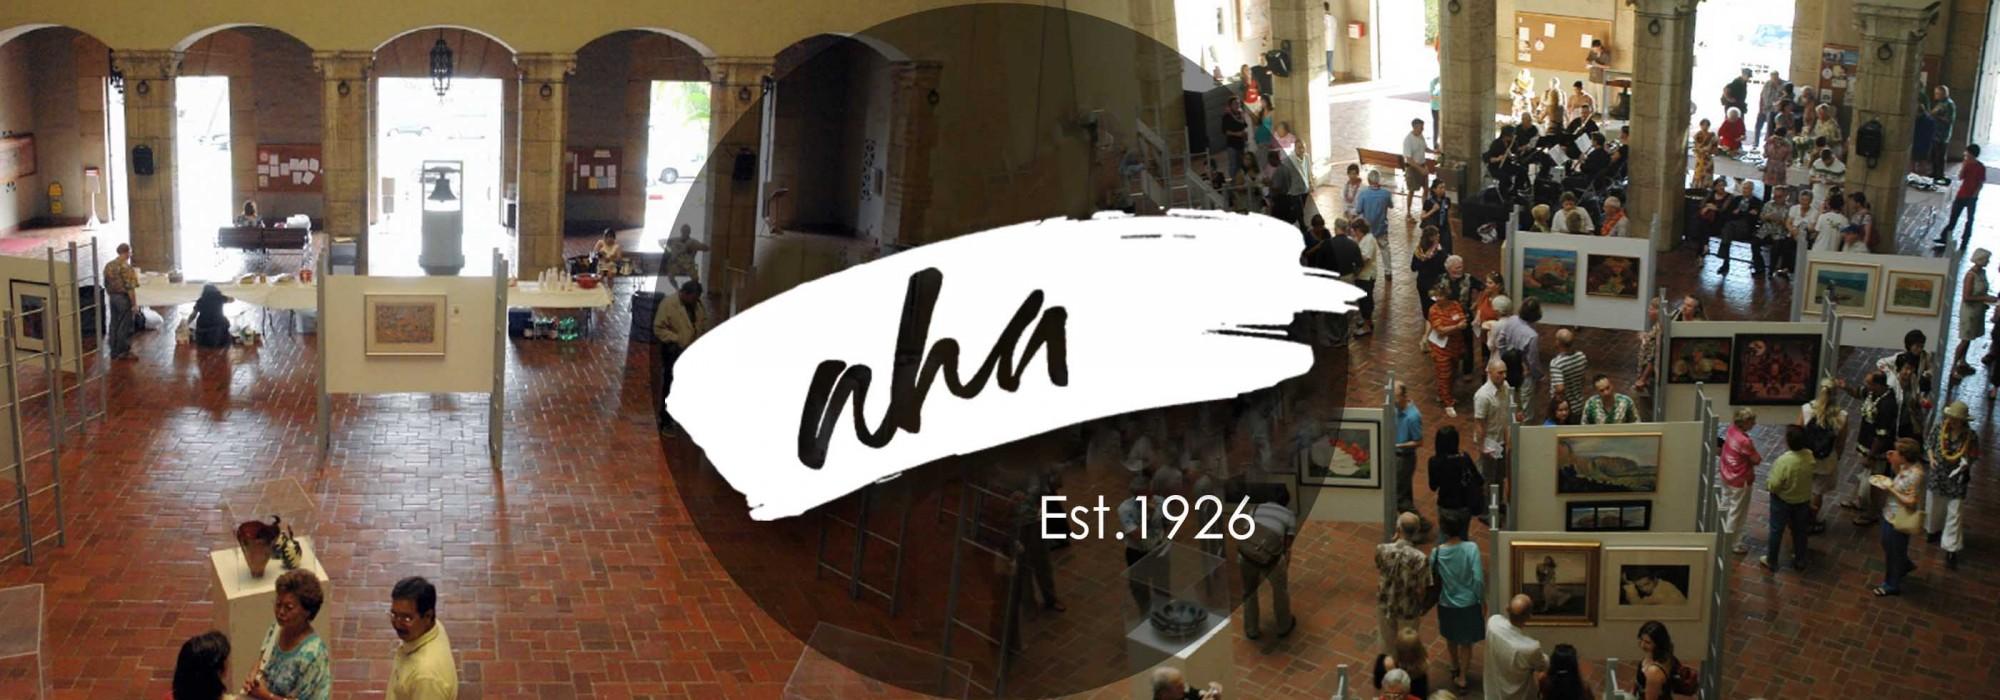 aha-home-banner-1